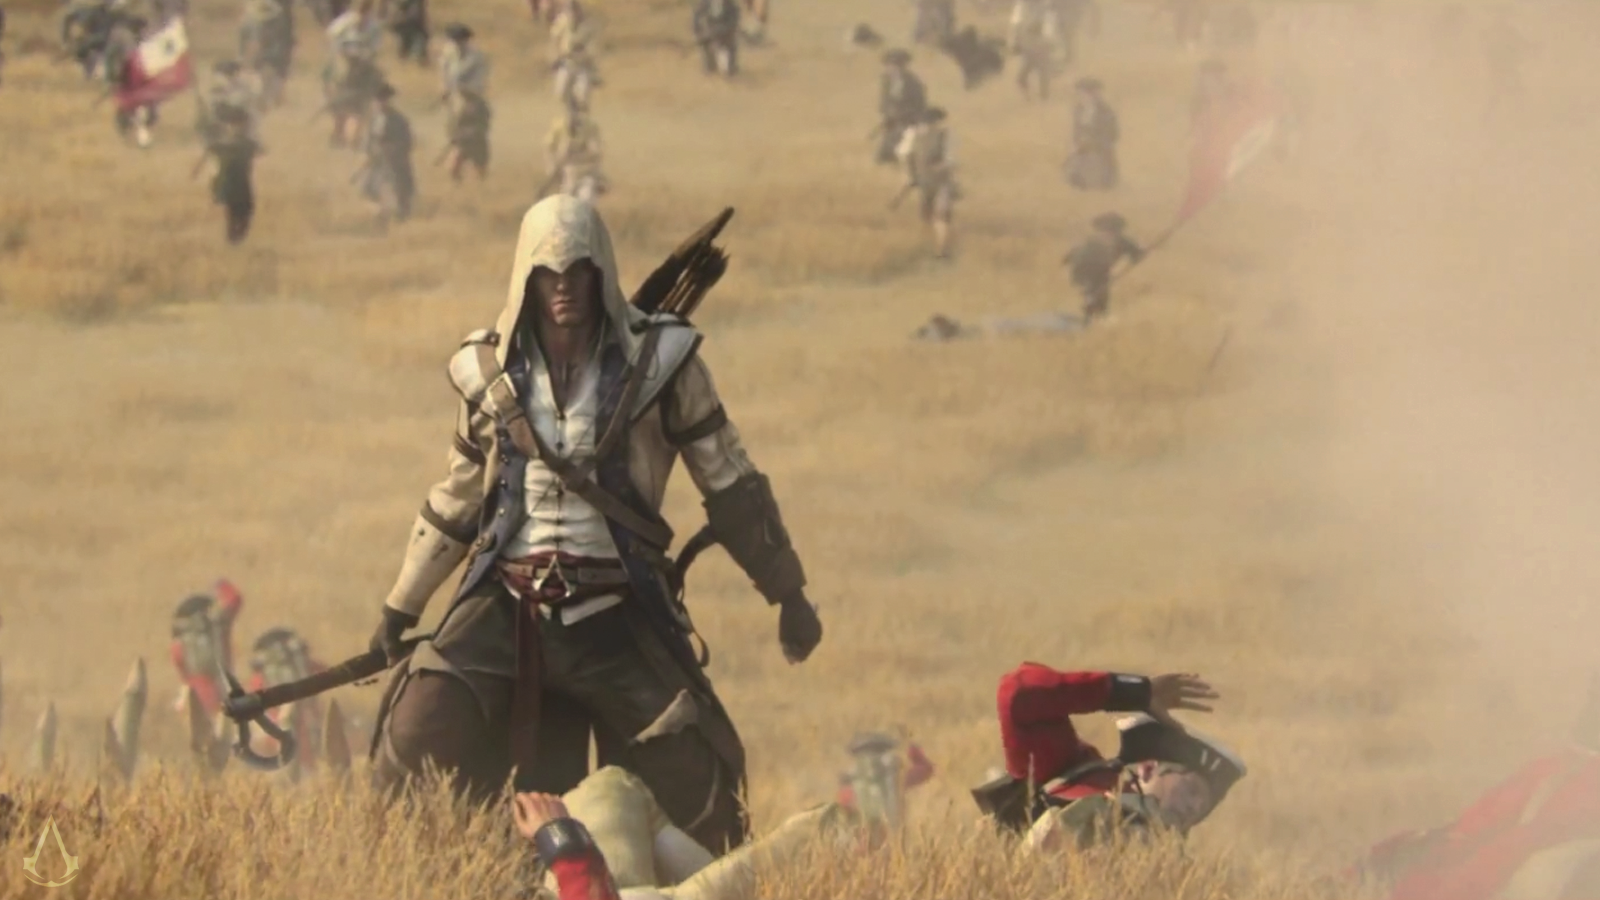 Assassins Creed 3 Connor Wallpaper By Pablodoogenfloggen On Deviantart